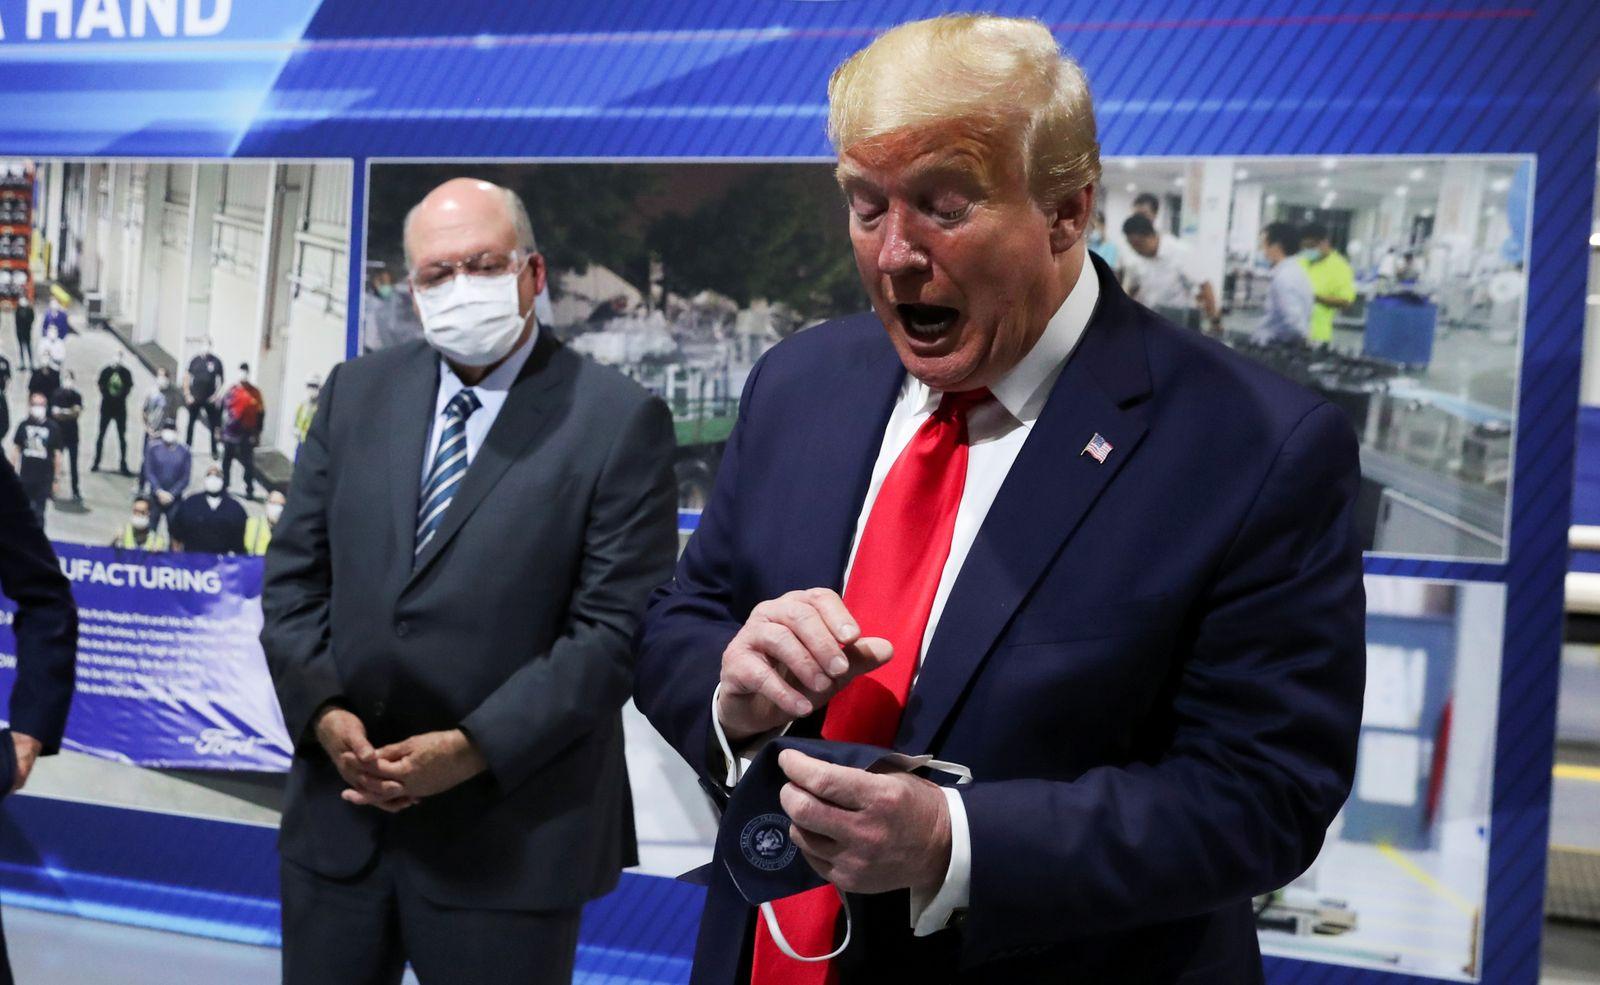 Donald Trump / Gesichtsmaske / Ford